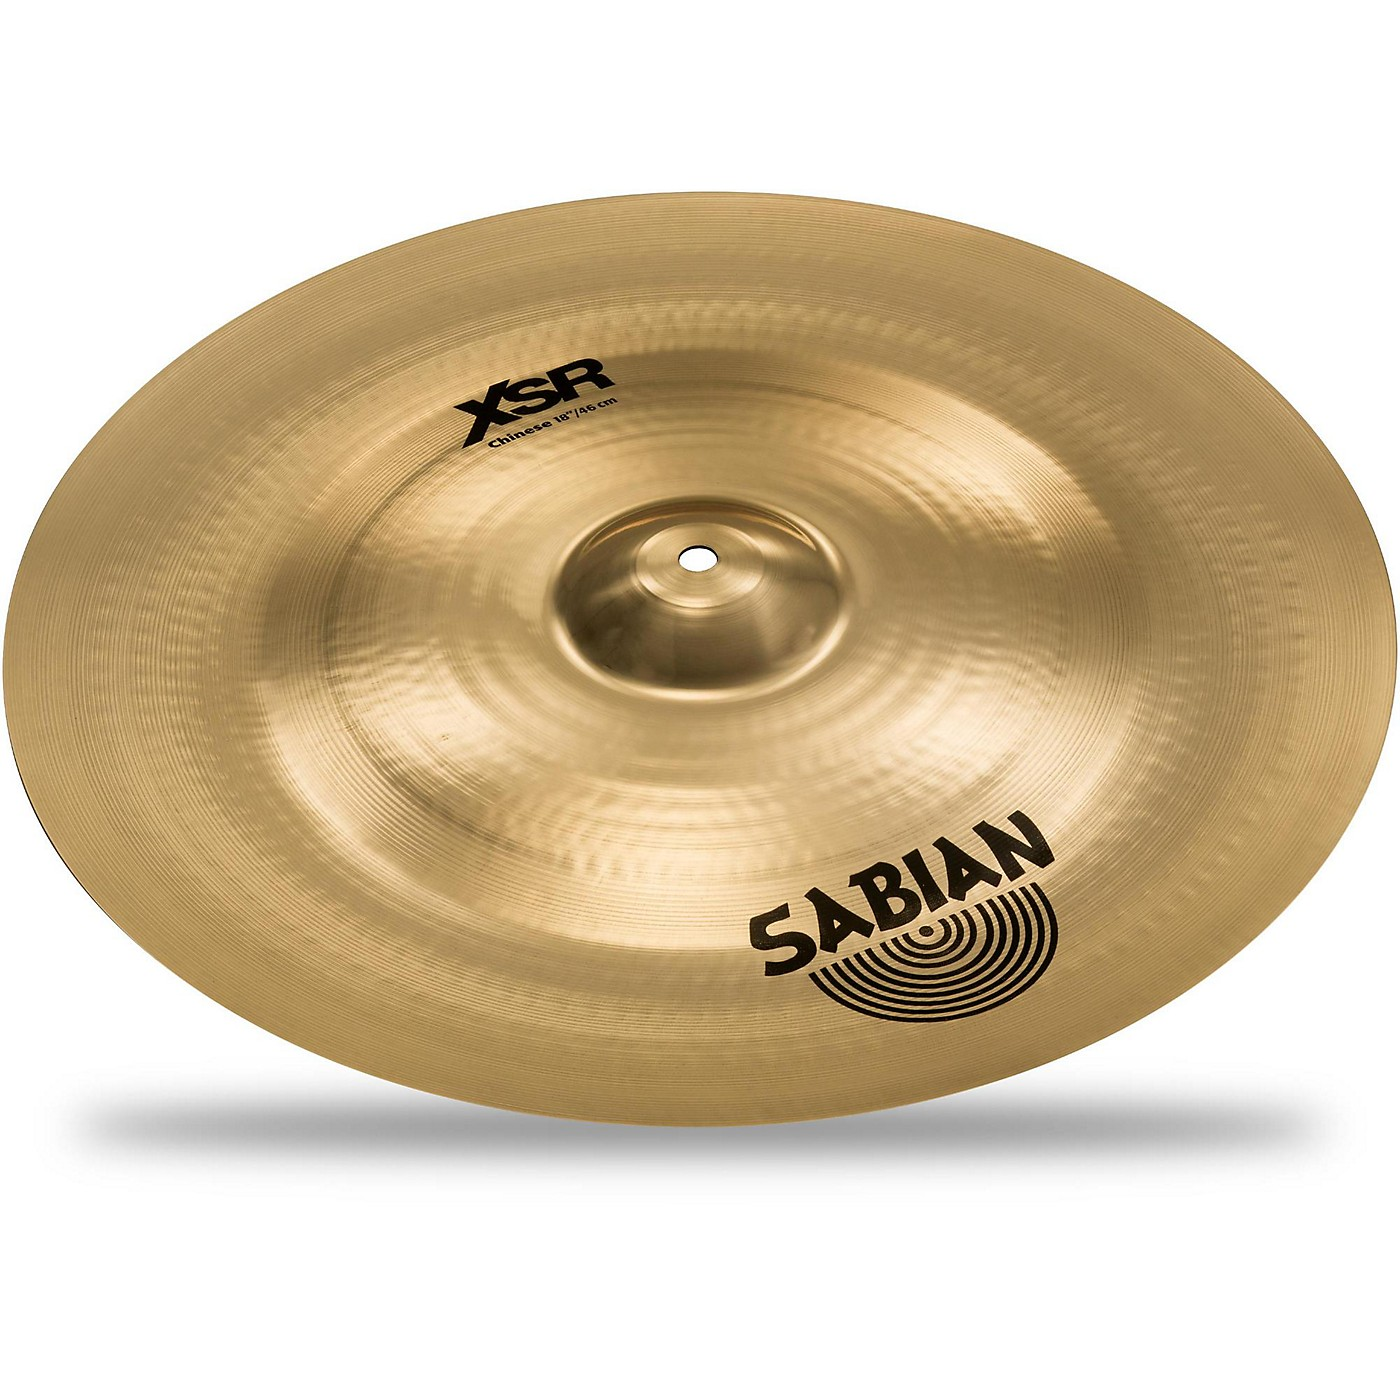 Sabian XSR Series Chinese Cymbal thumbnail